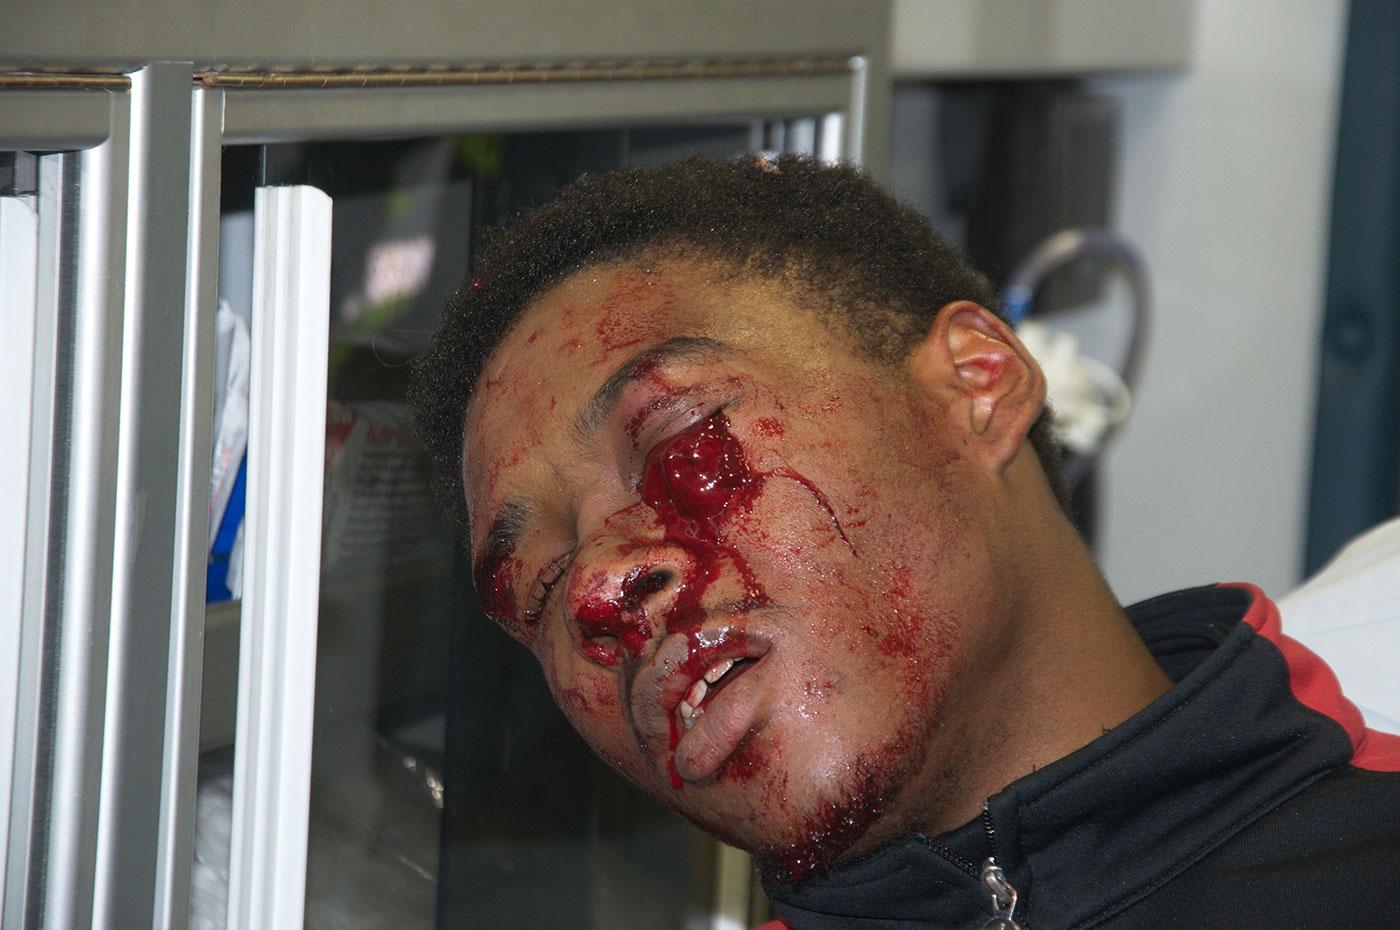 Scene photo taken by Durham Regional Police Service - warning graphic